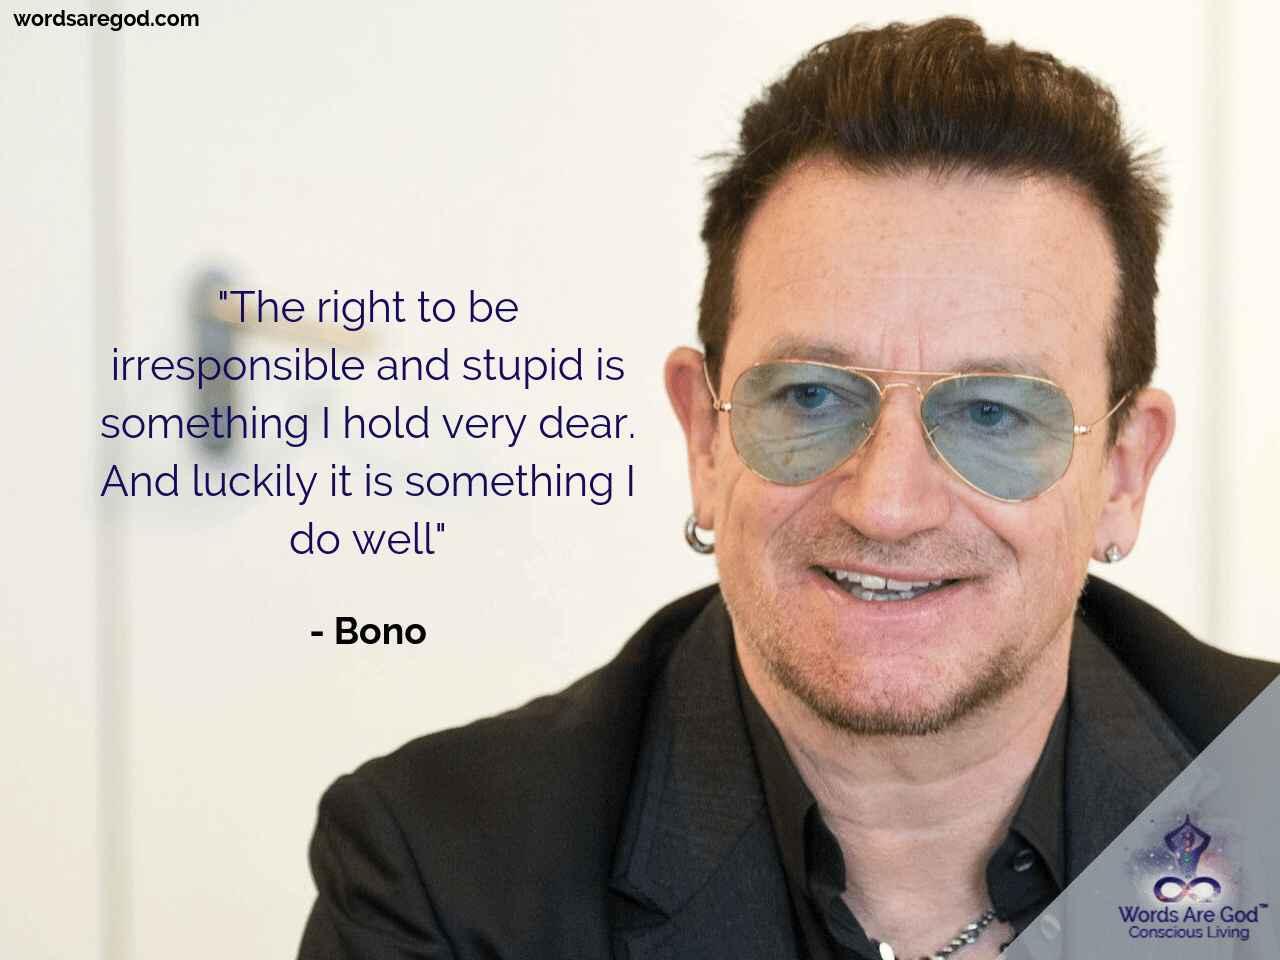 Bono Inspirational quote